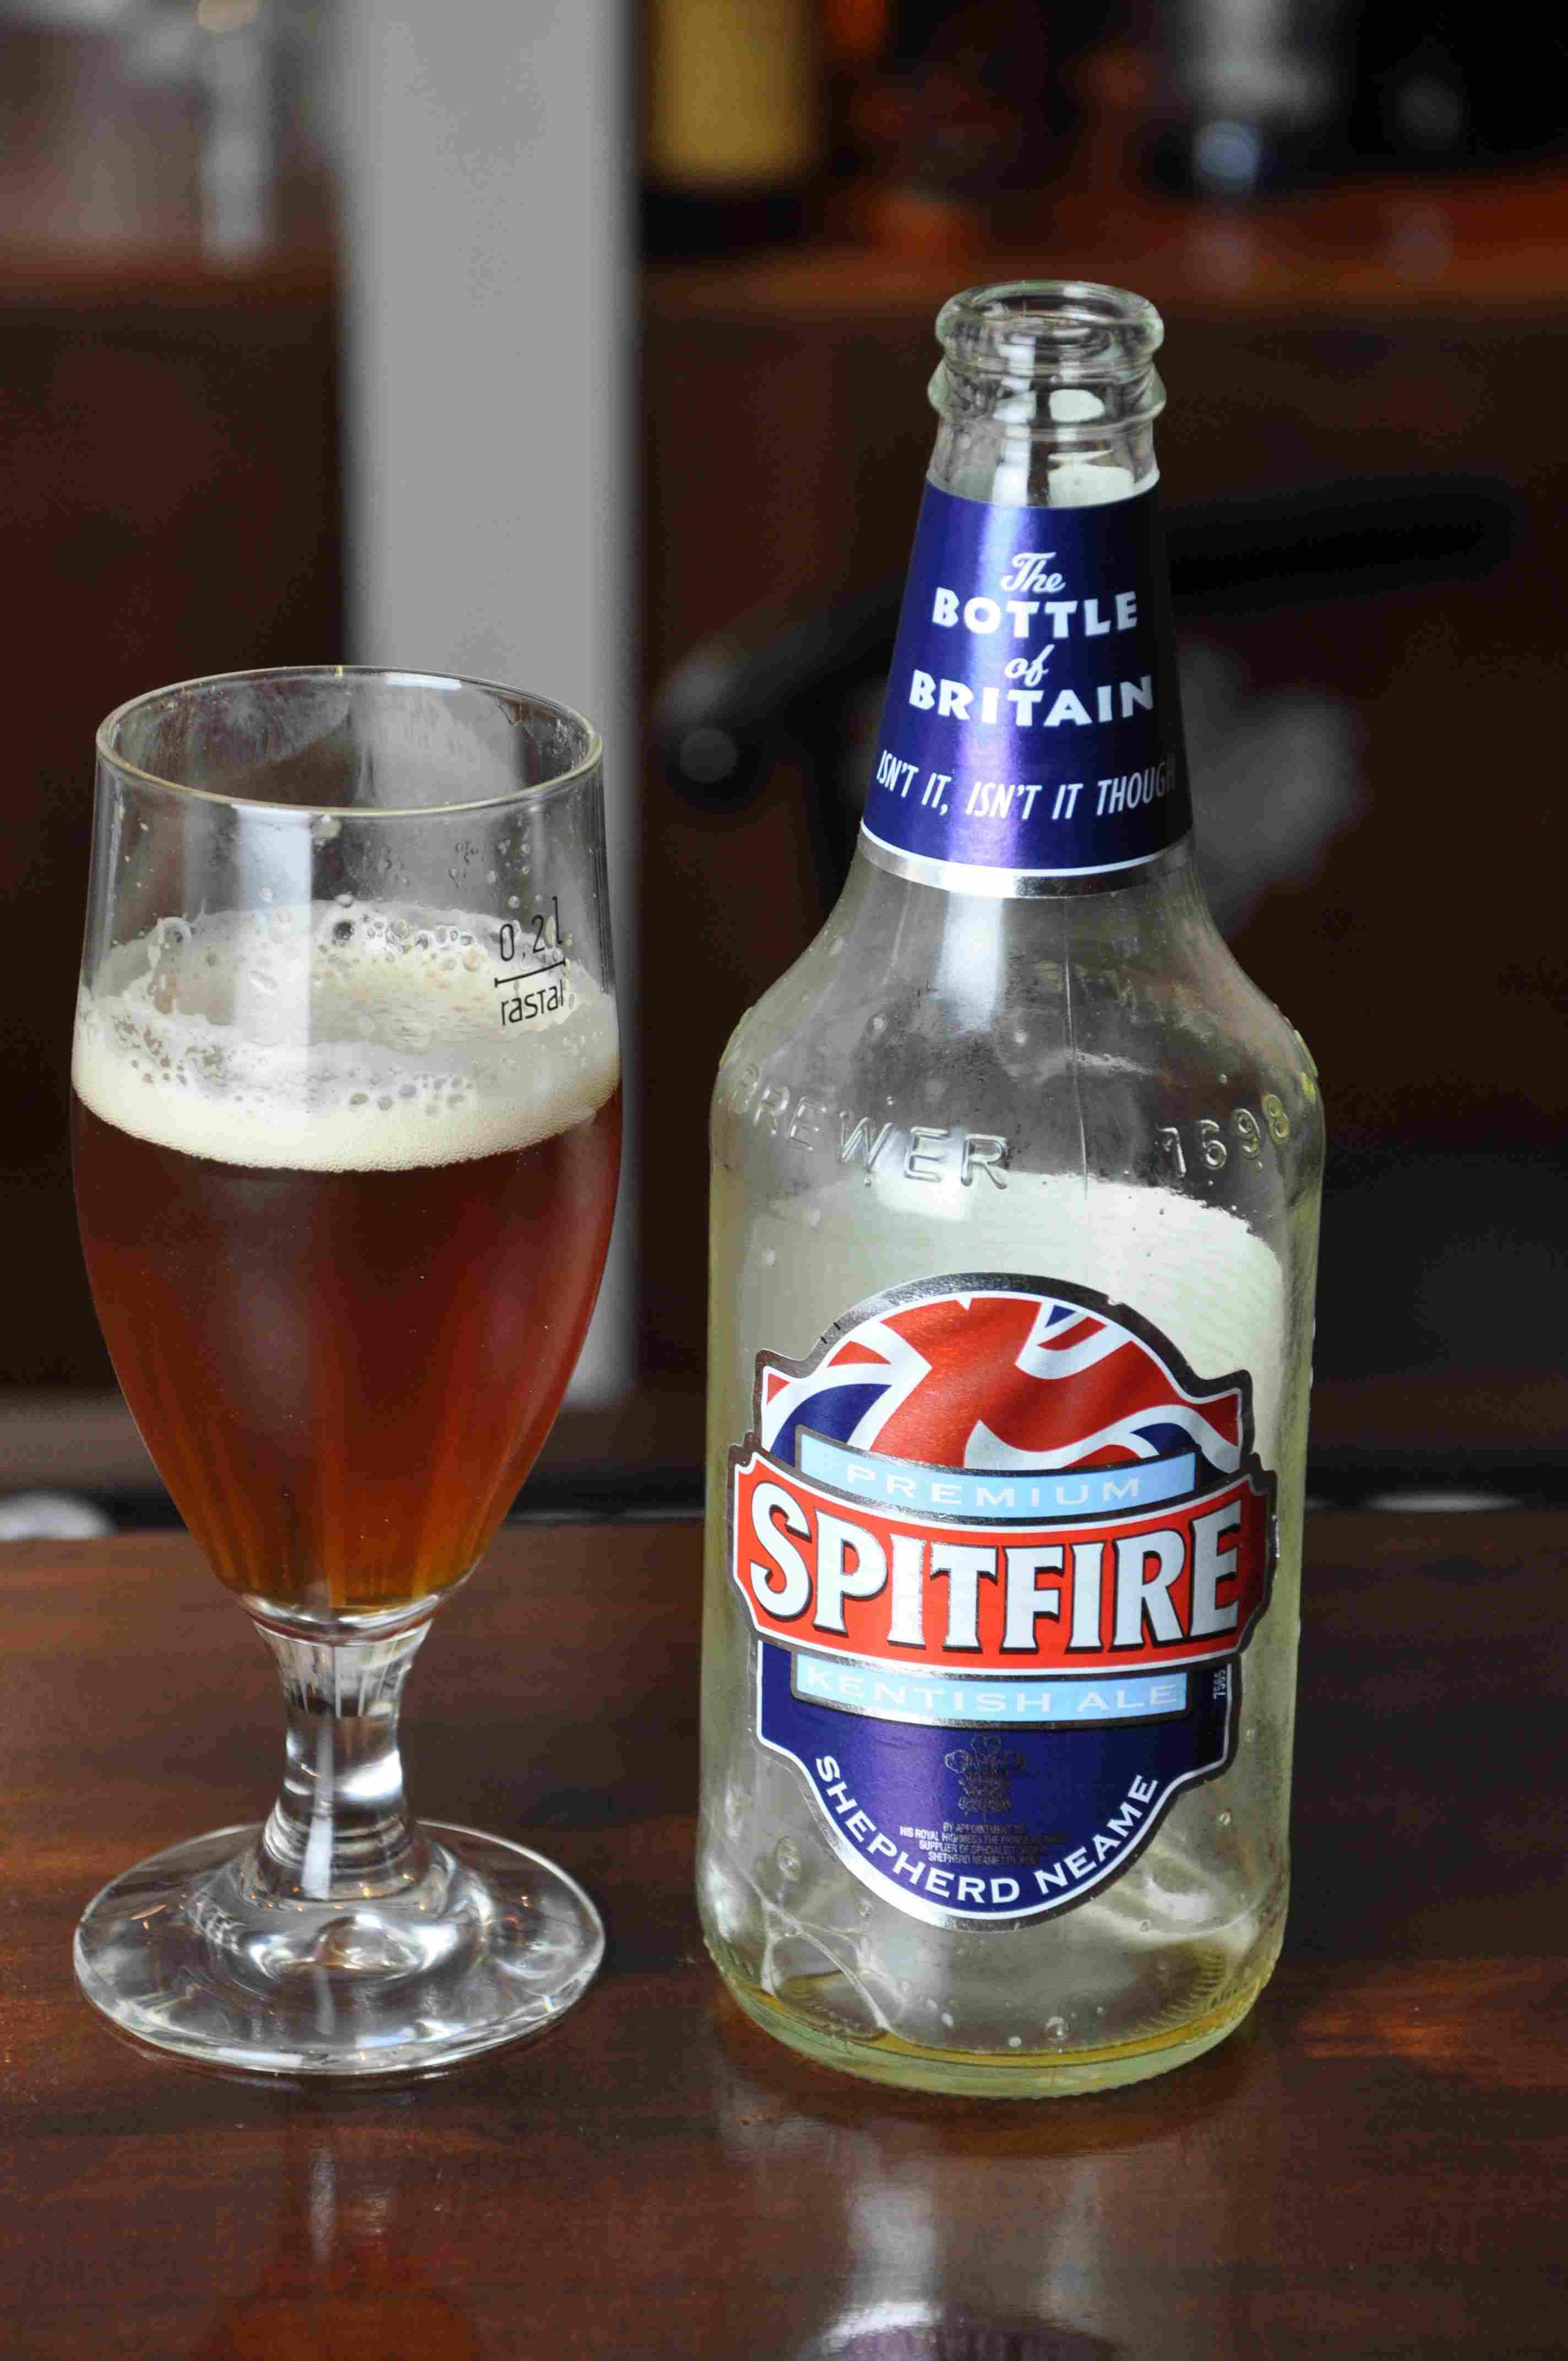 ShepherdNeame_Spitfire